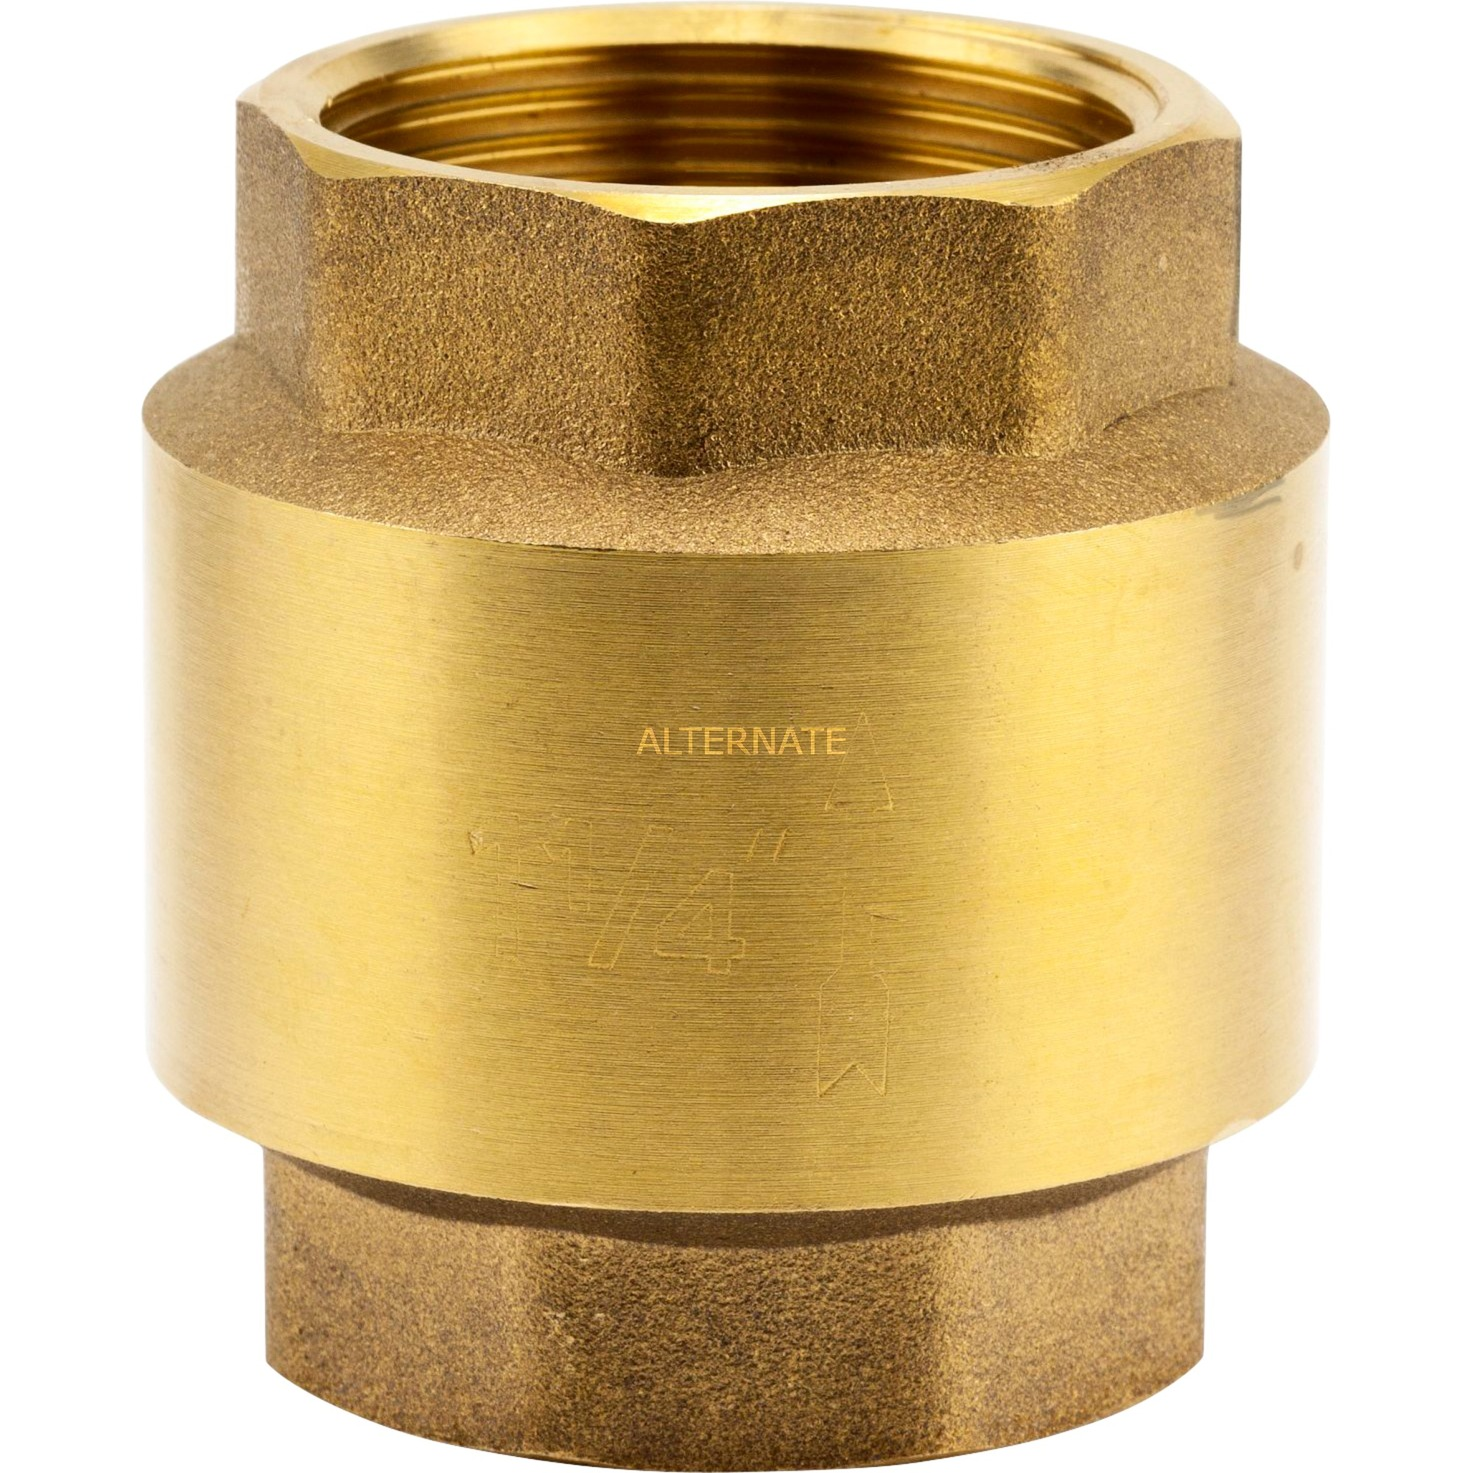 7232-20 valve, Herrajes técnicos